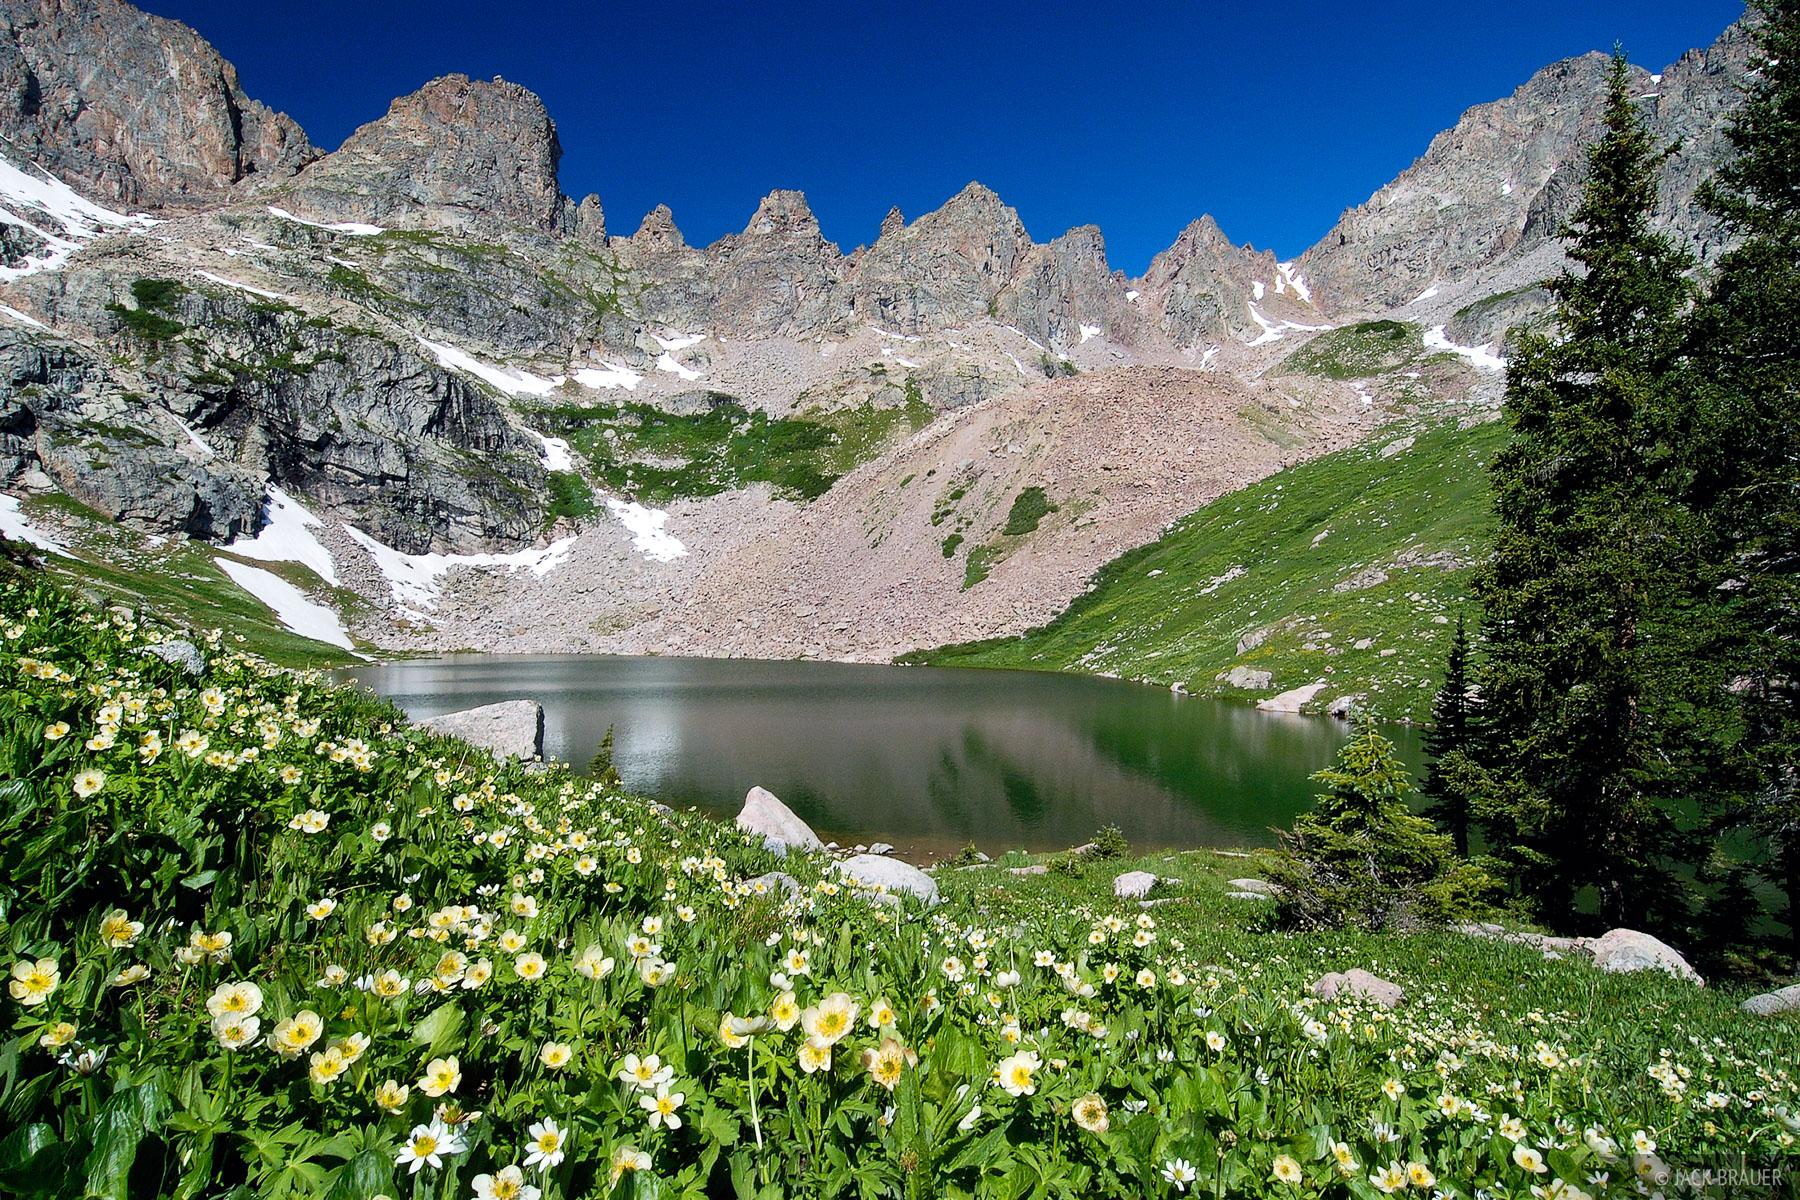 Willow Lakes, wildflowers, Eagles Nest Wilderness, Gore Range, Colorado, photo